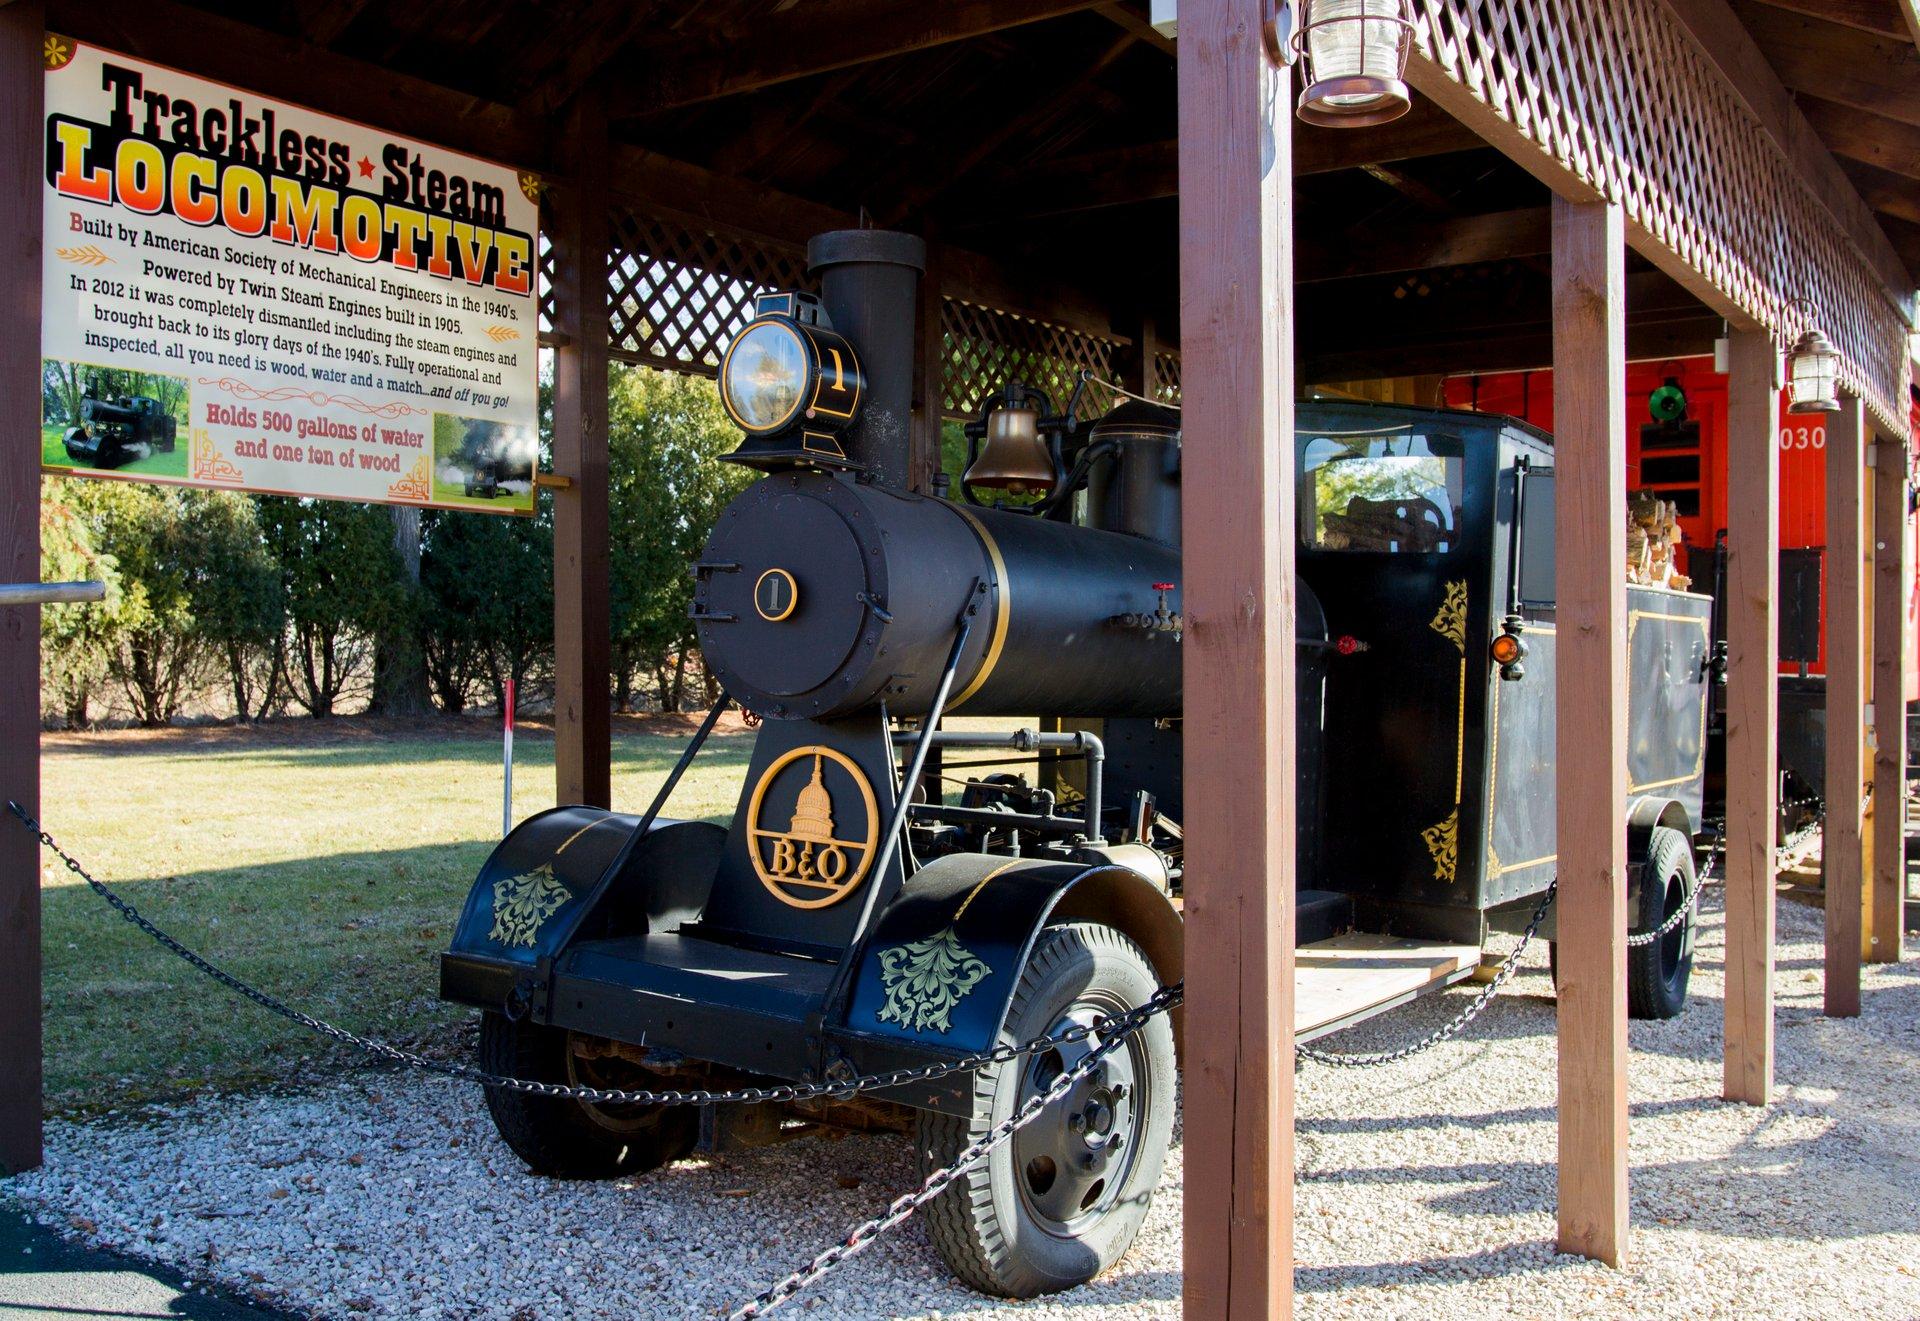 1948 b o steam road locomotive